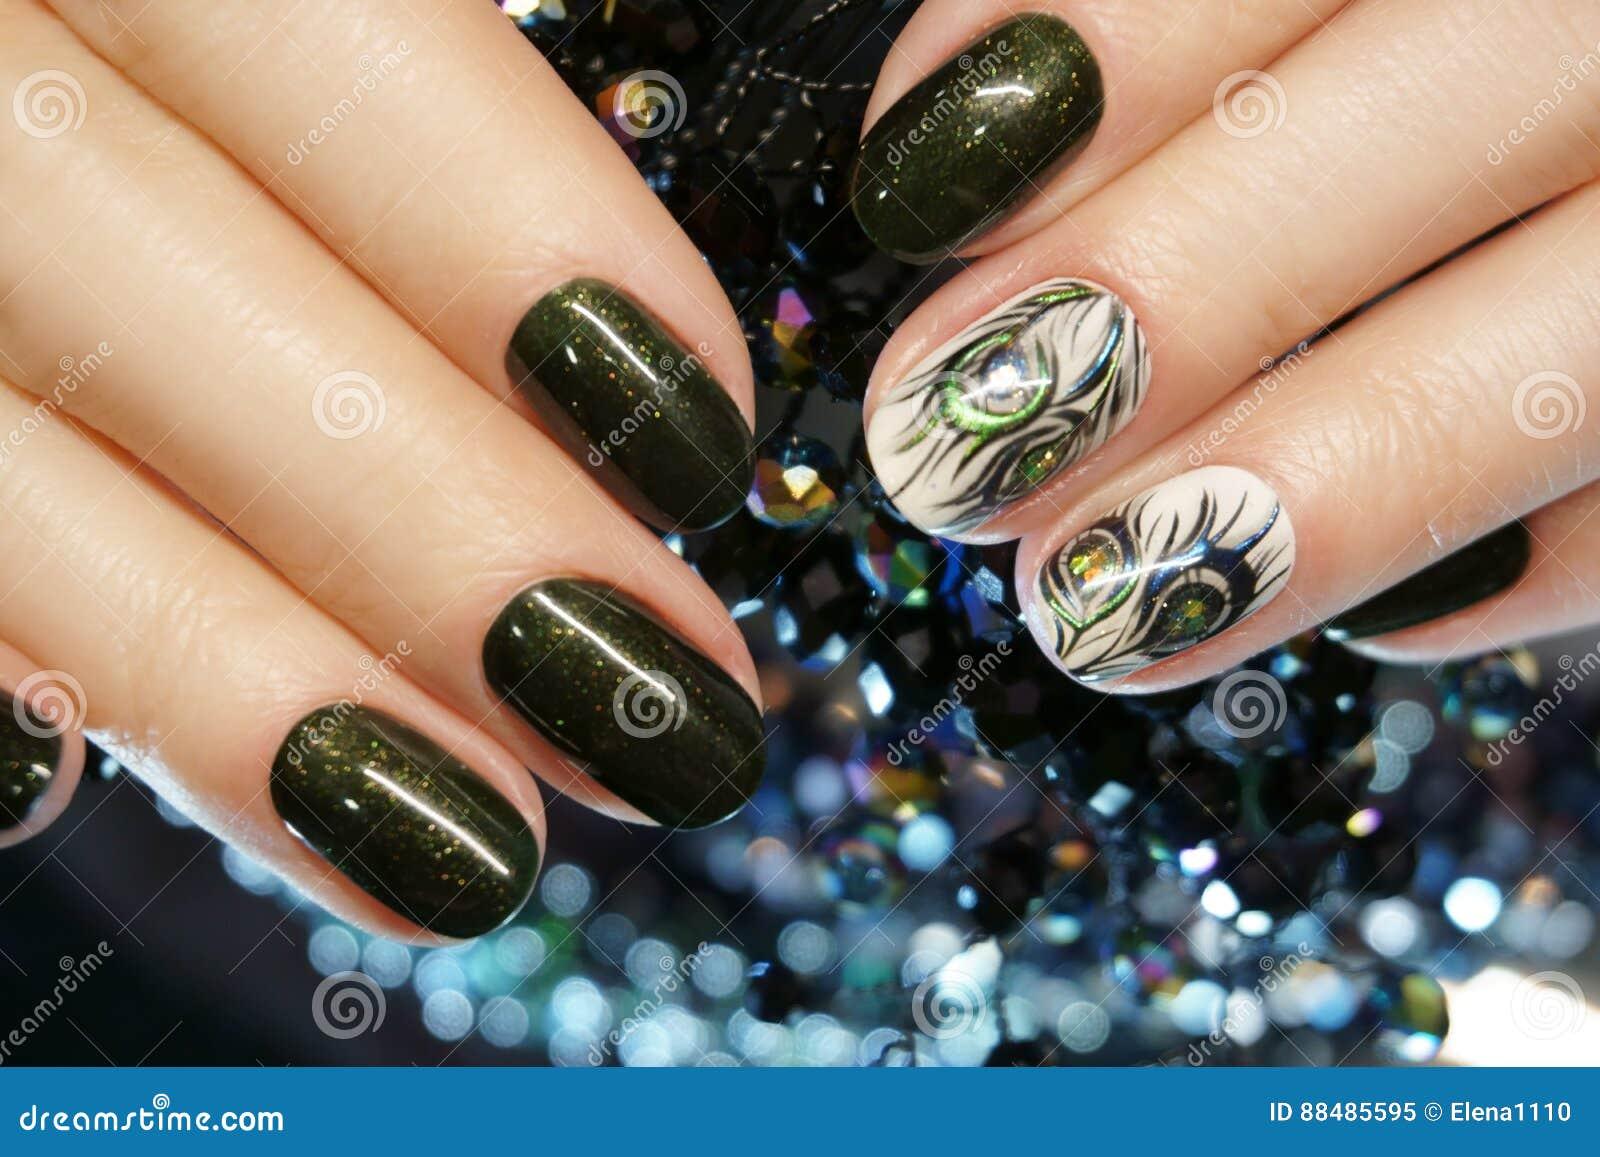 Beautiful Nail Atr Manicure Nail Designs With Decorationnicu